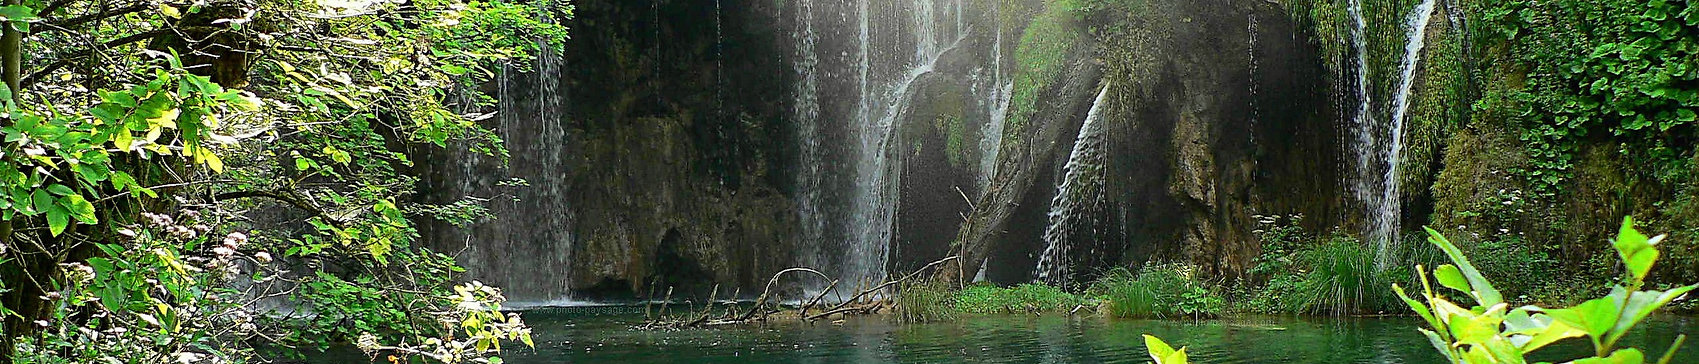 paradis-lac-cascade-plitvice.jpg